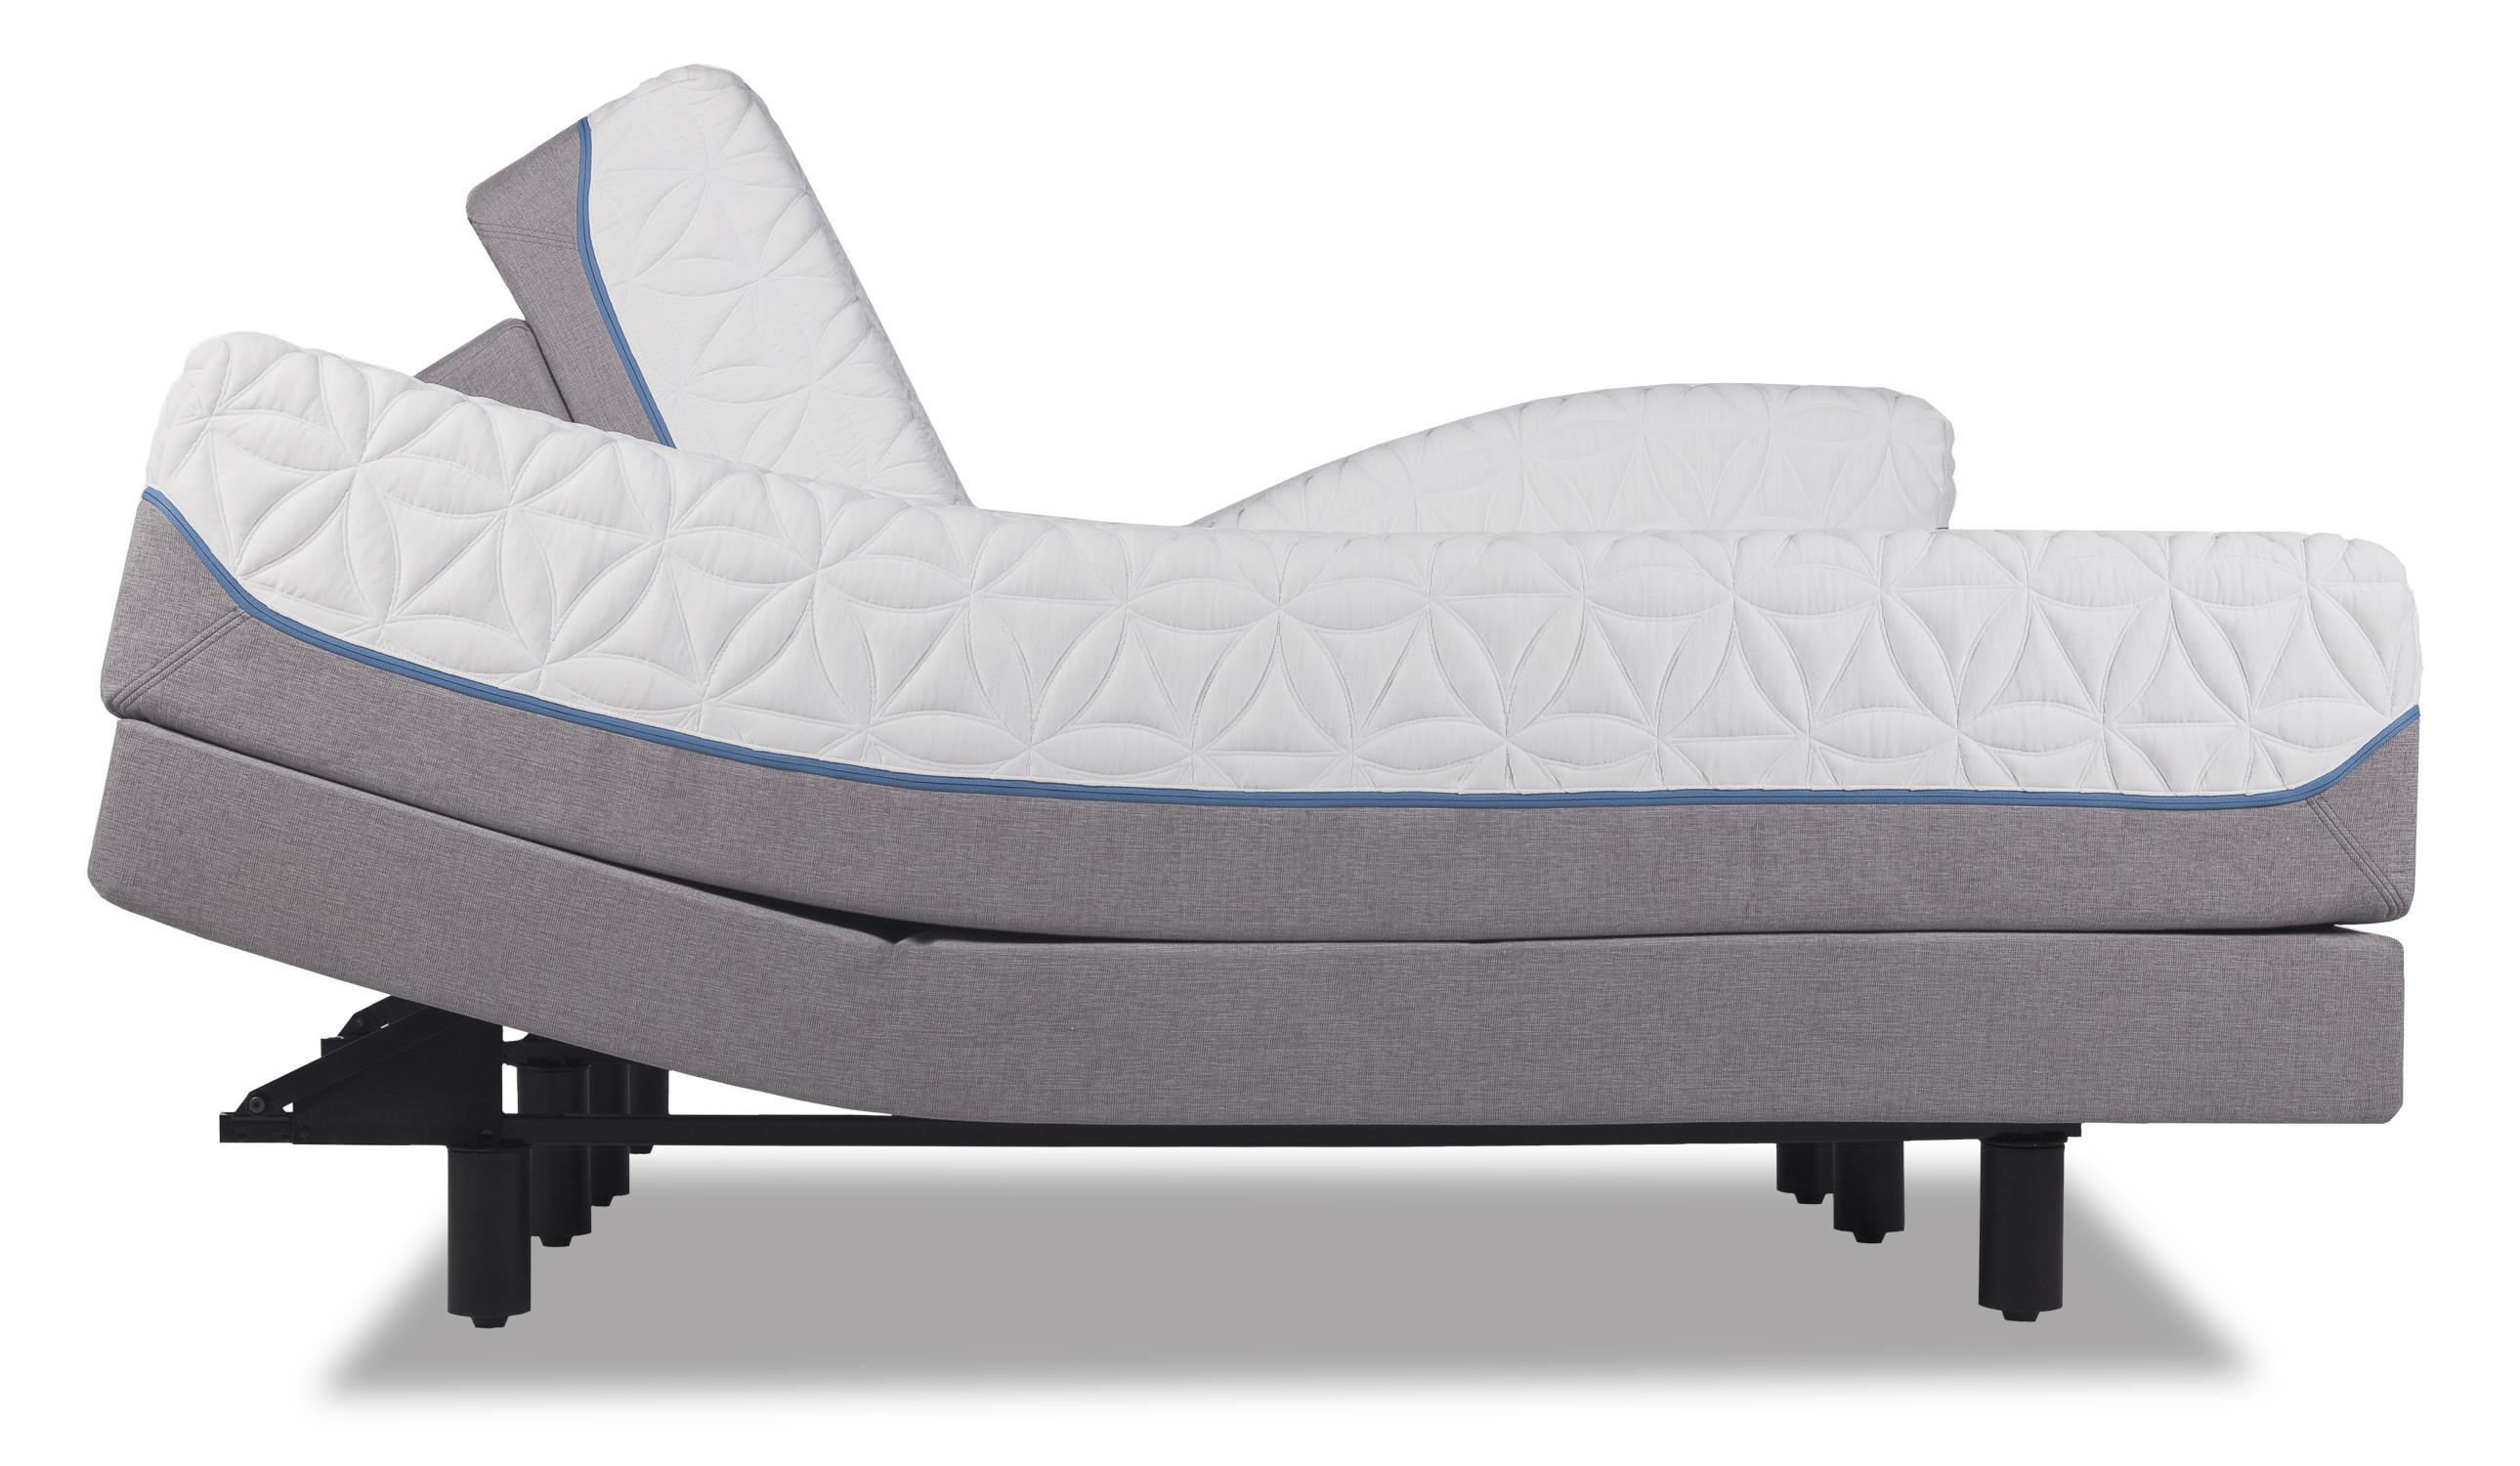 Tempur-Pedic® TEMPUR-Cloud Luxe King Ultra-Soft Mattress Set - Item Number: 10245270+2x25565220